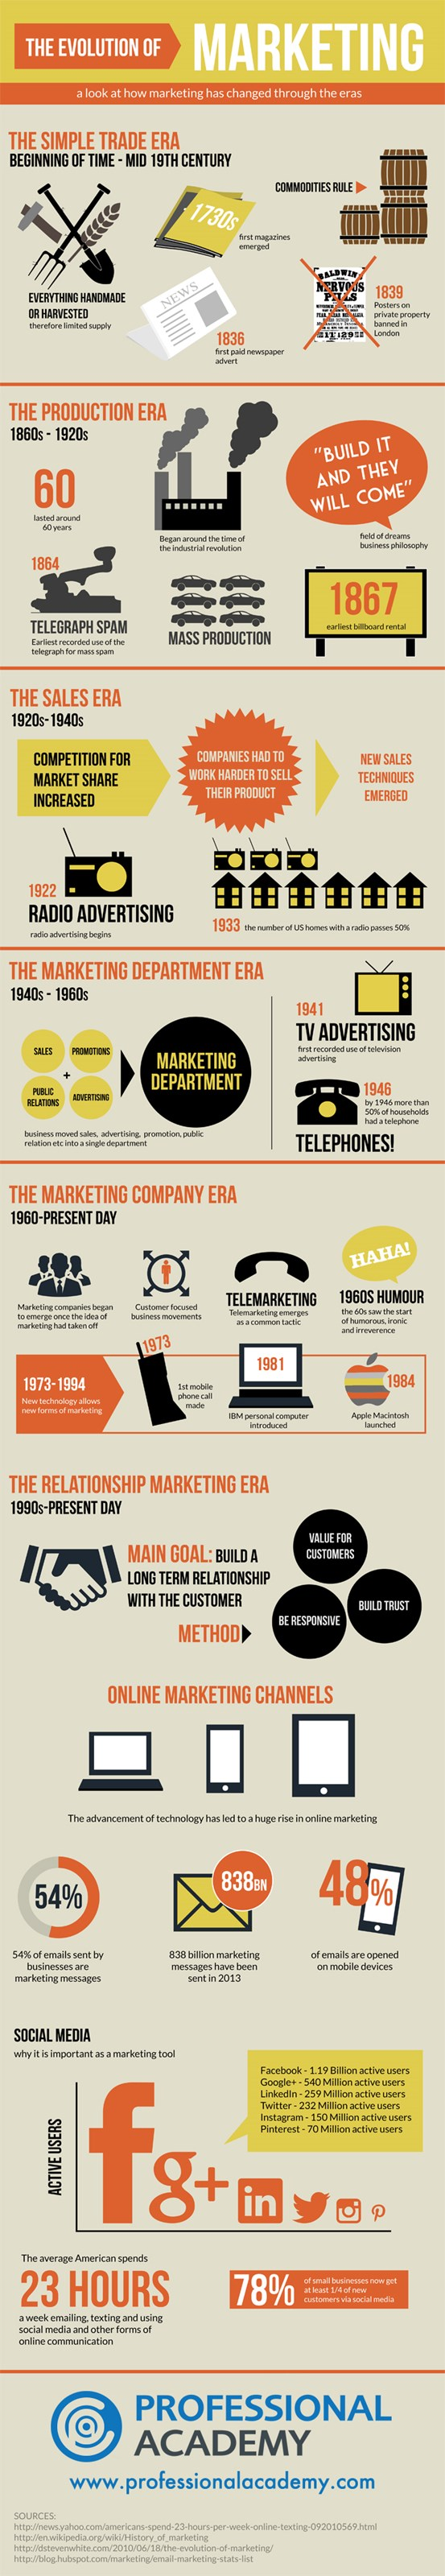 Evolution of marketing infographic